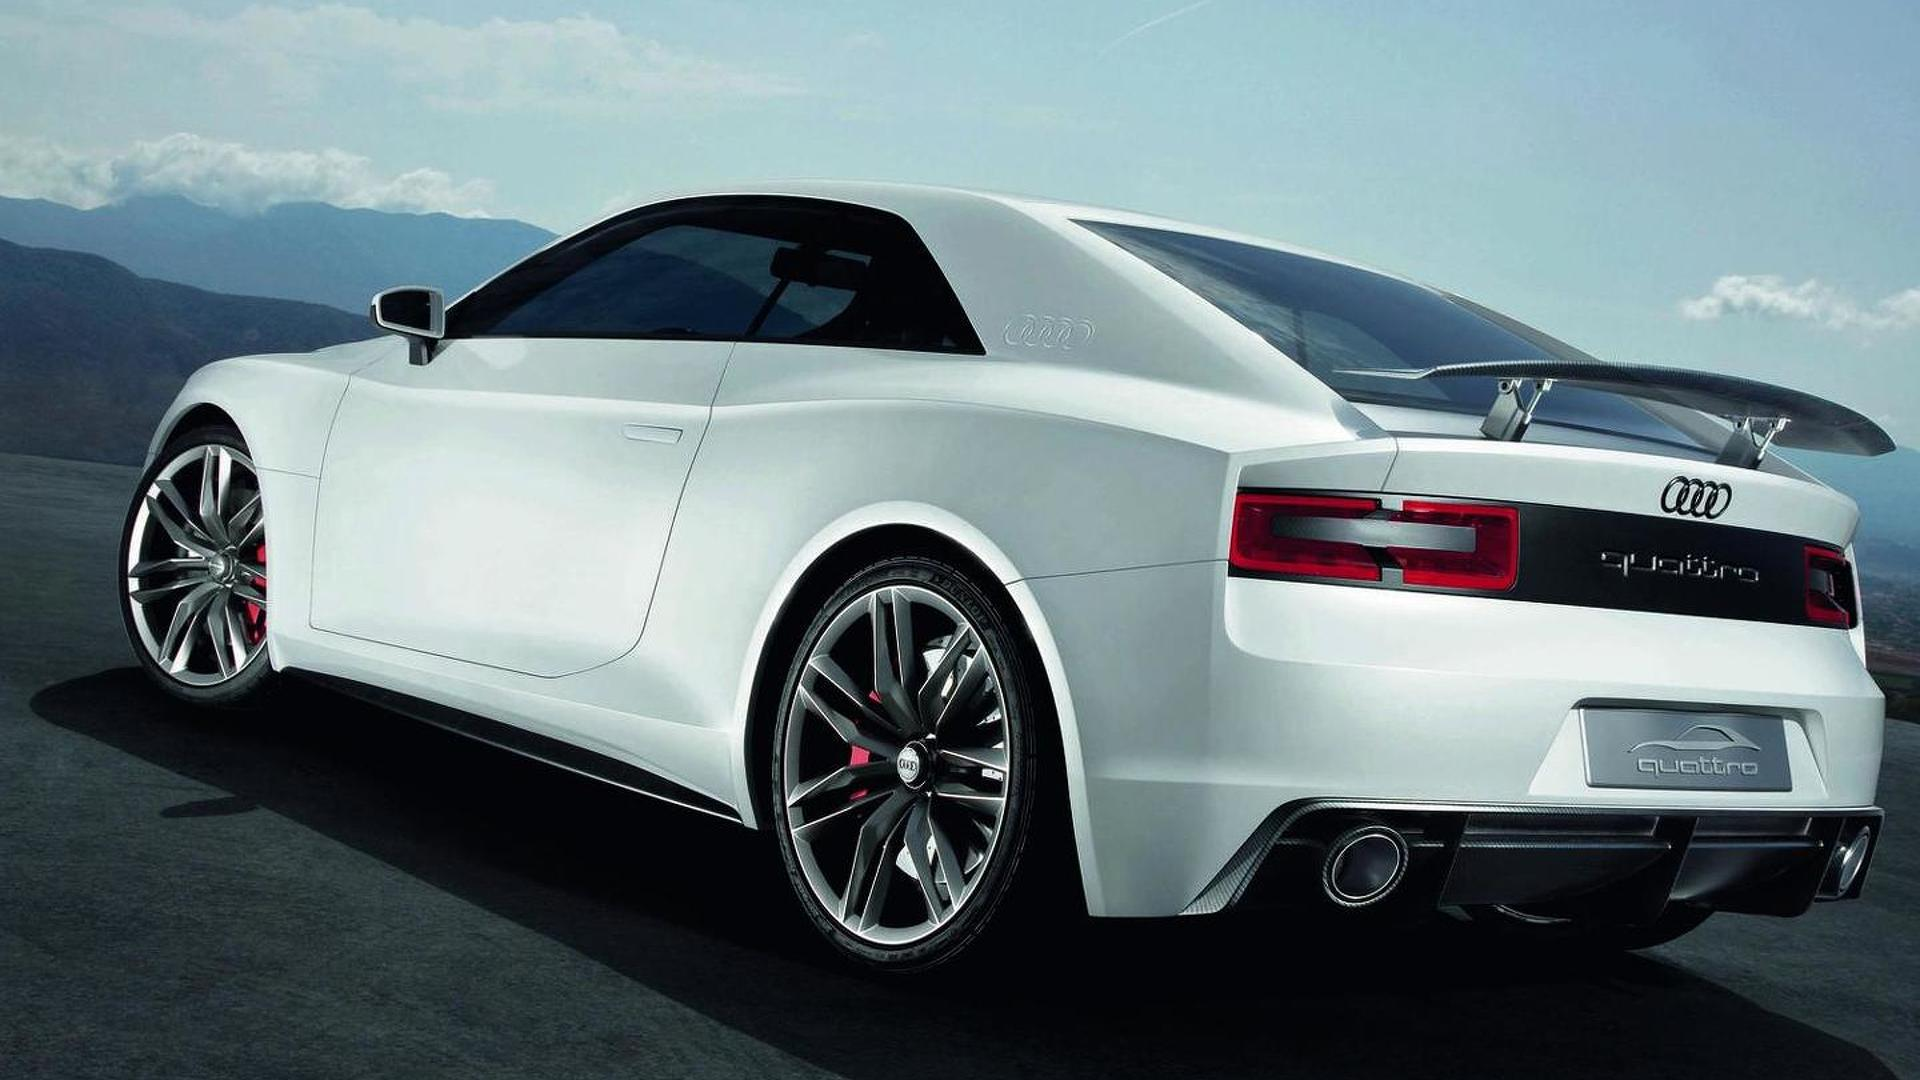 Audi Quattro concept headed for production - report